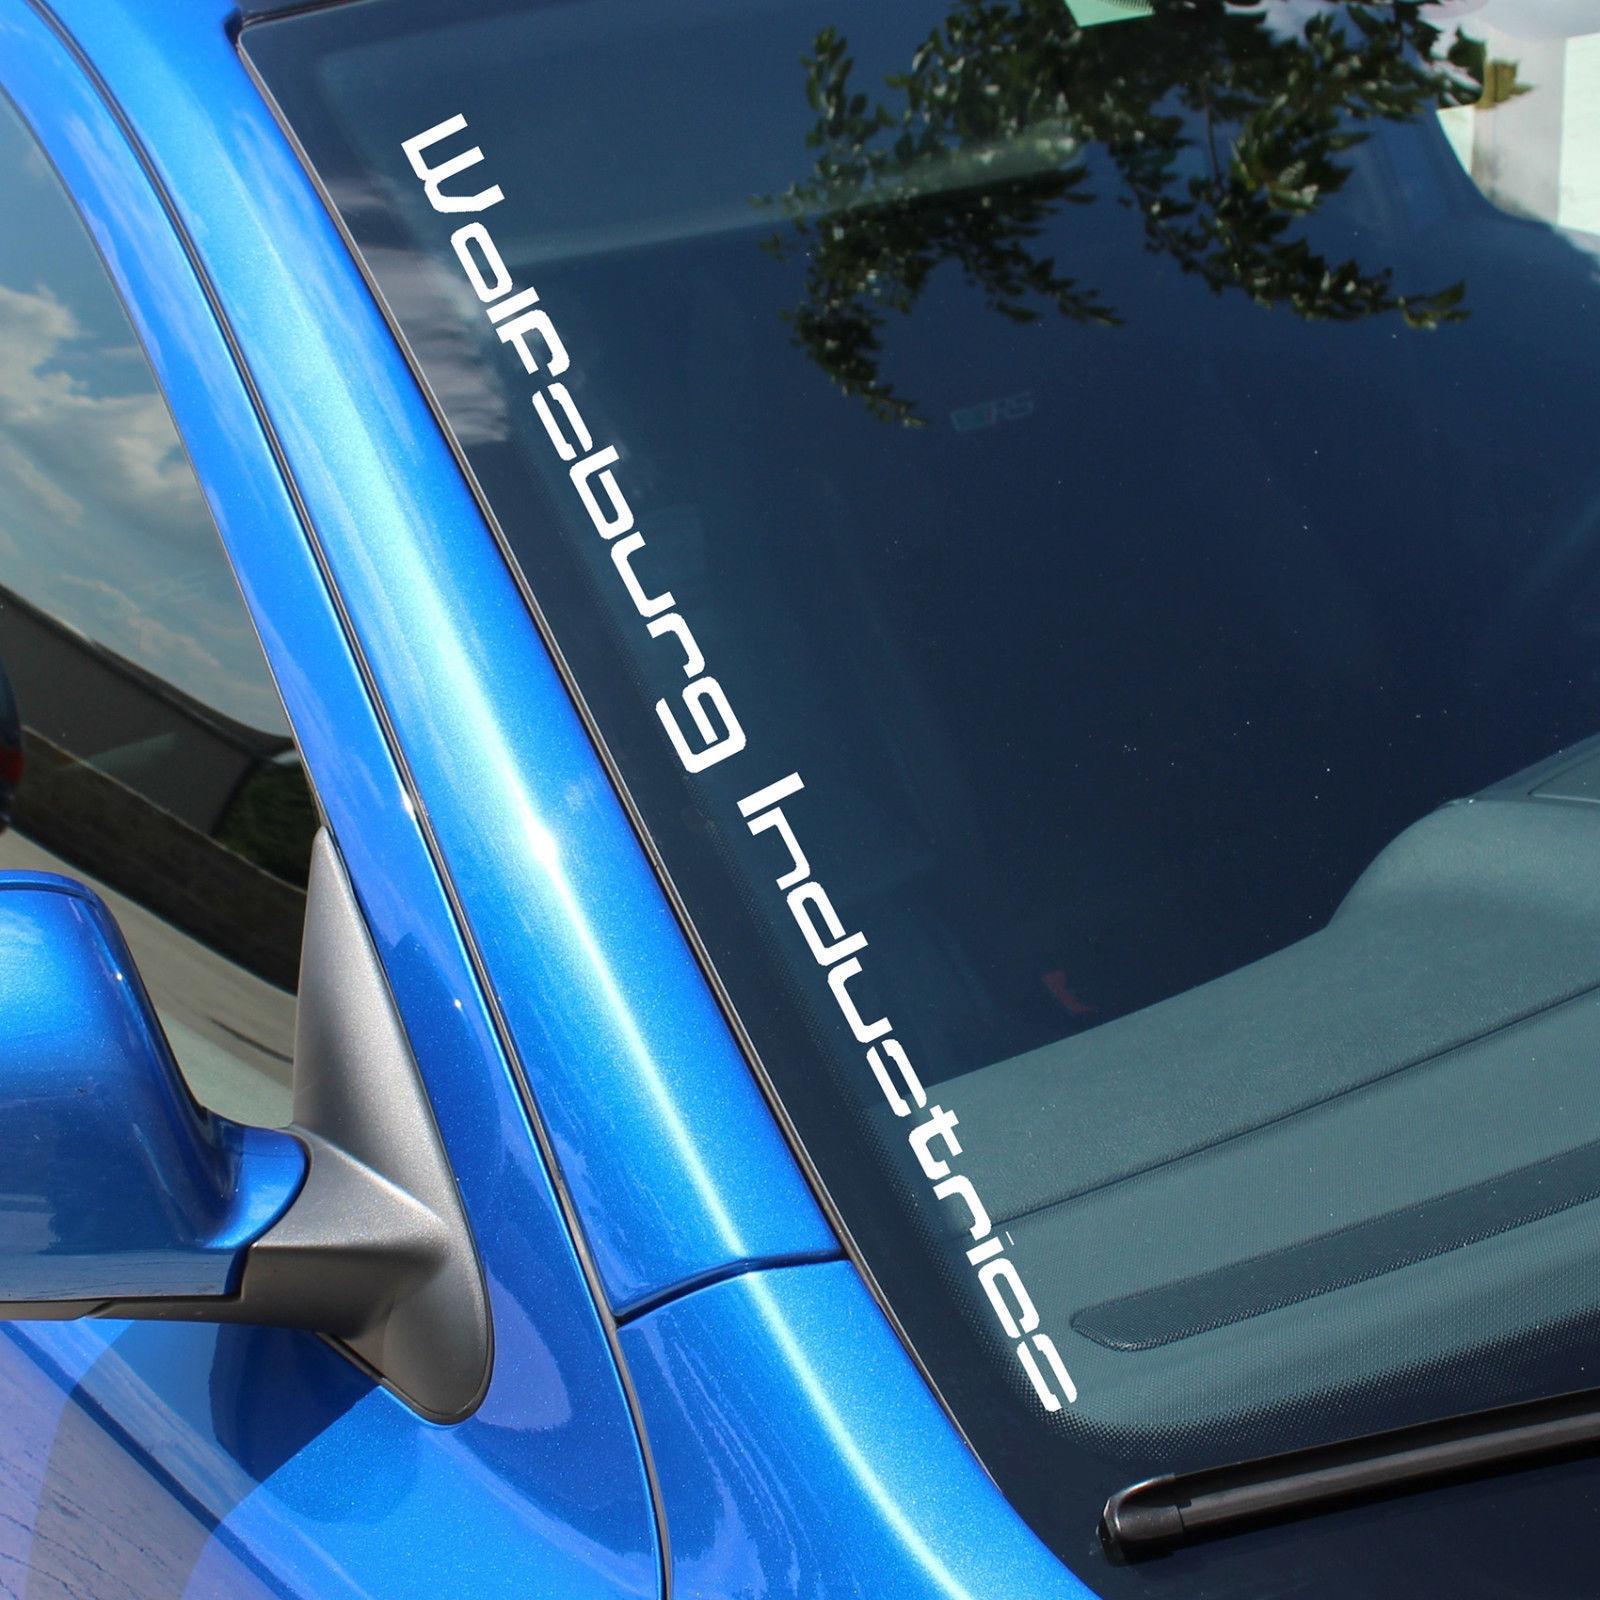 Wolfsburg Industries V2 Windshield Sticker Decal Foil Tuning Car